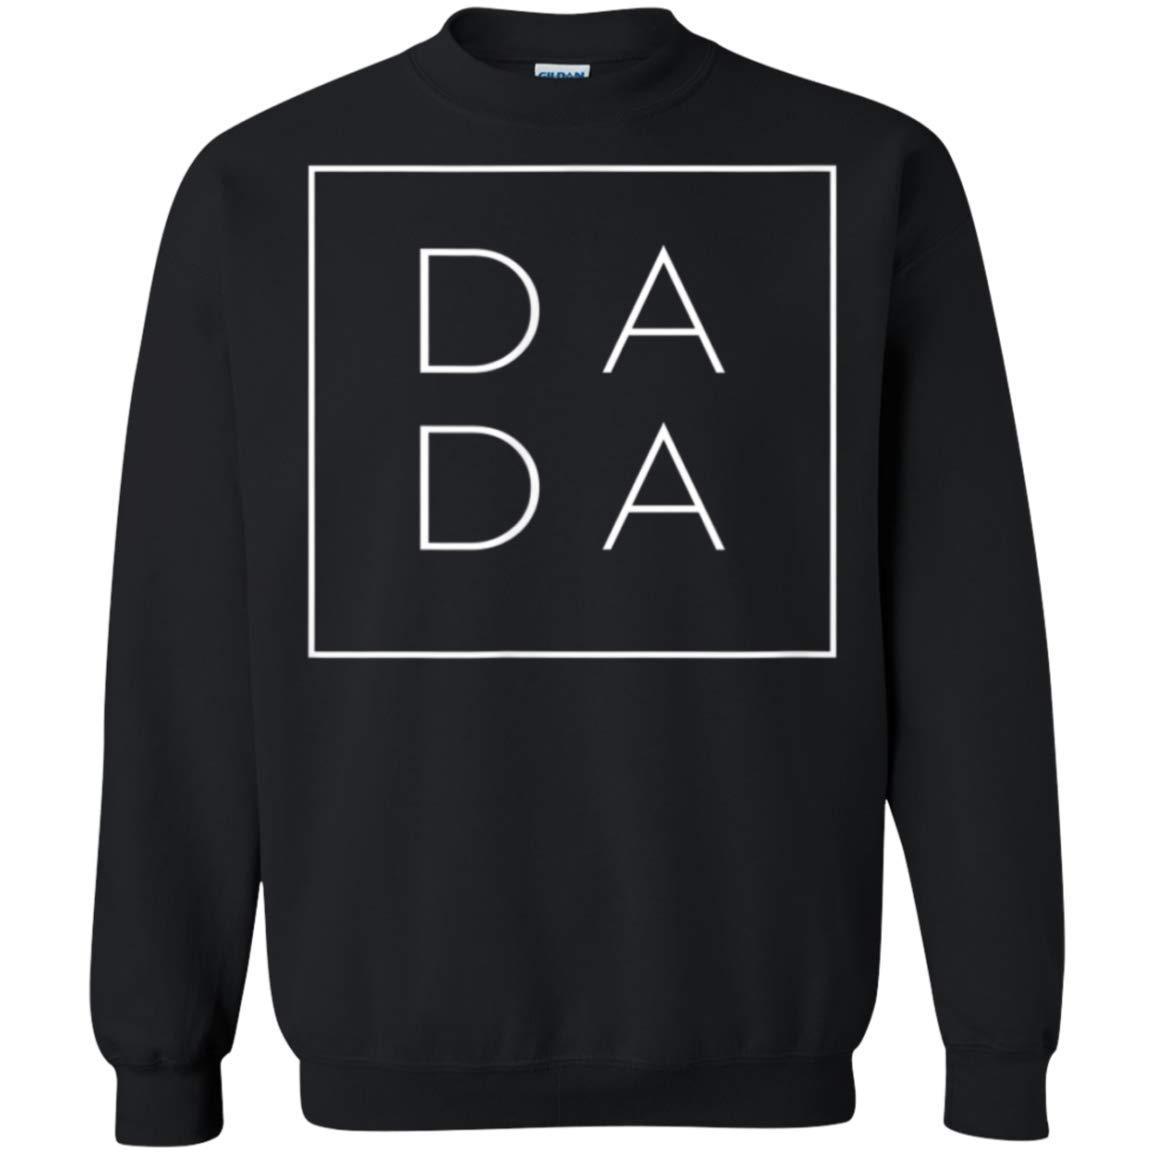 Funny Square Dada Shirt Idea For Dad Father Papa Grandpa Daddy Crewneck Pullover For